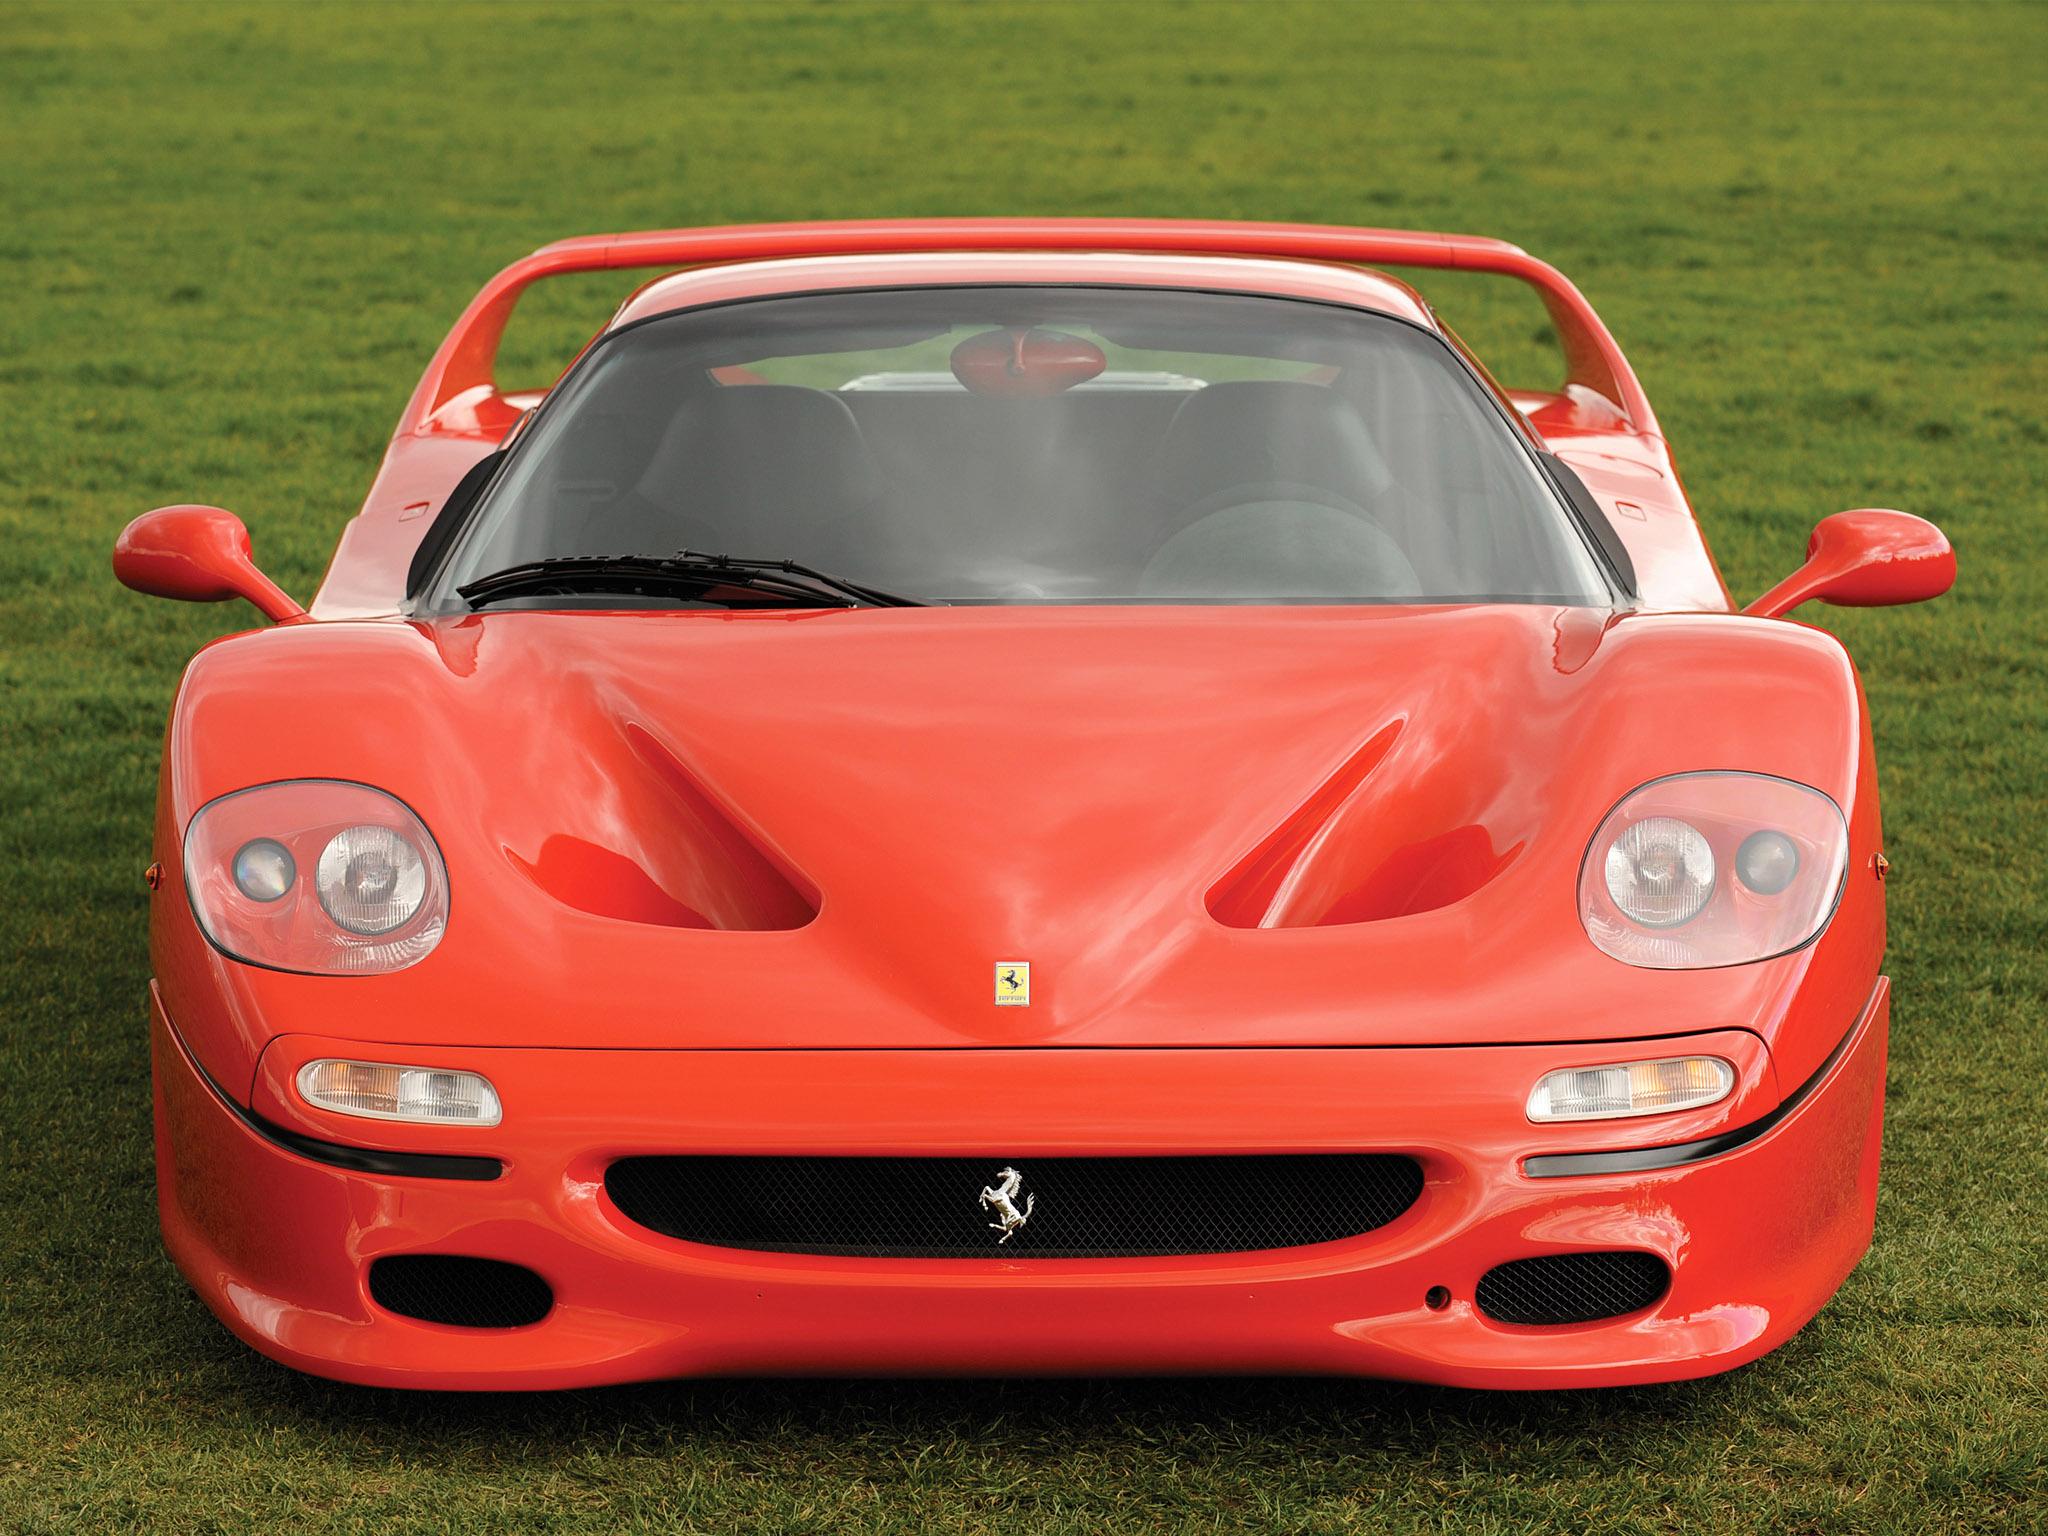 Ferrari f50 wallpaper choice image hd cars wallpaper 1995 ferrari f50 supercar supercars hf wallpaper 2048x1536 1995 ferrari f50 supercar supercars hf wallpaper 2048x1536 vanachro Choice Image